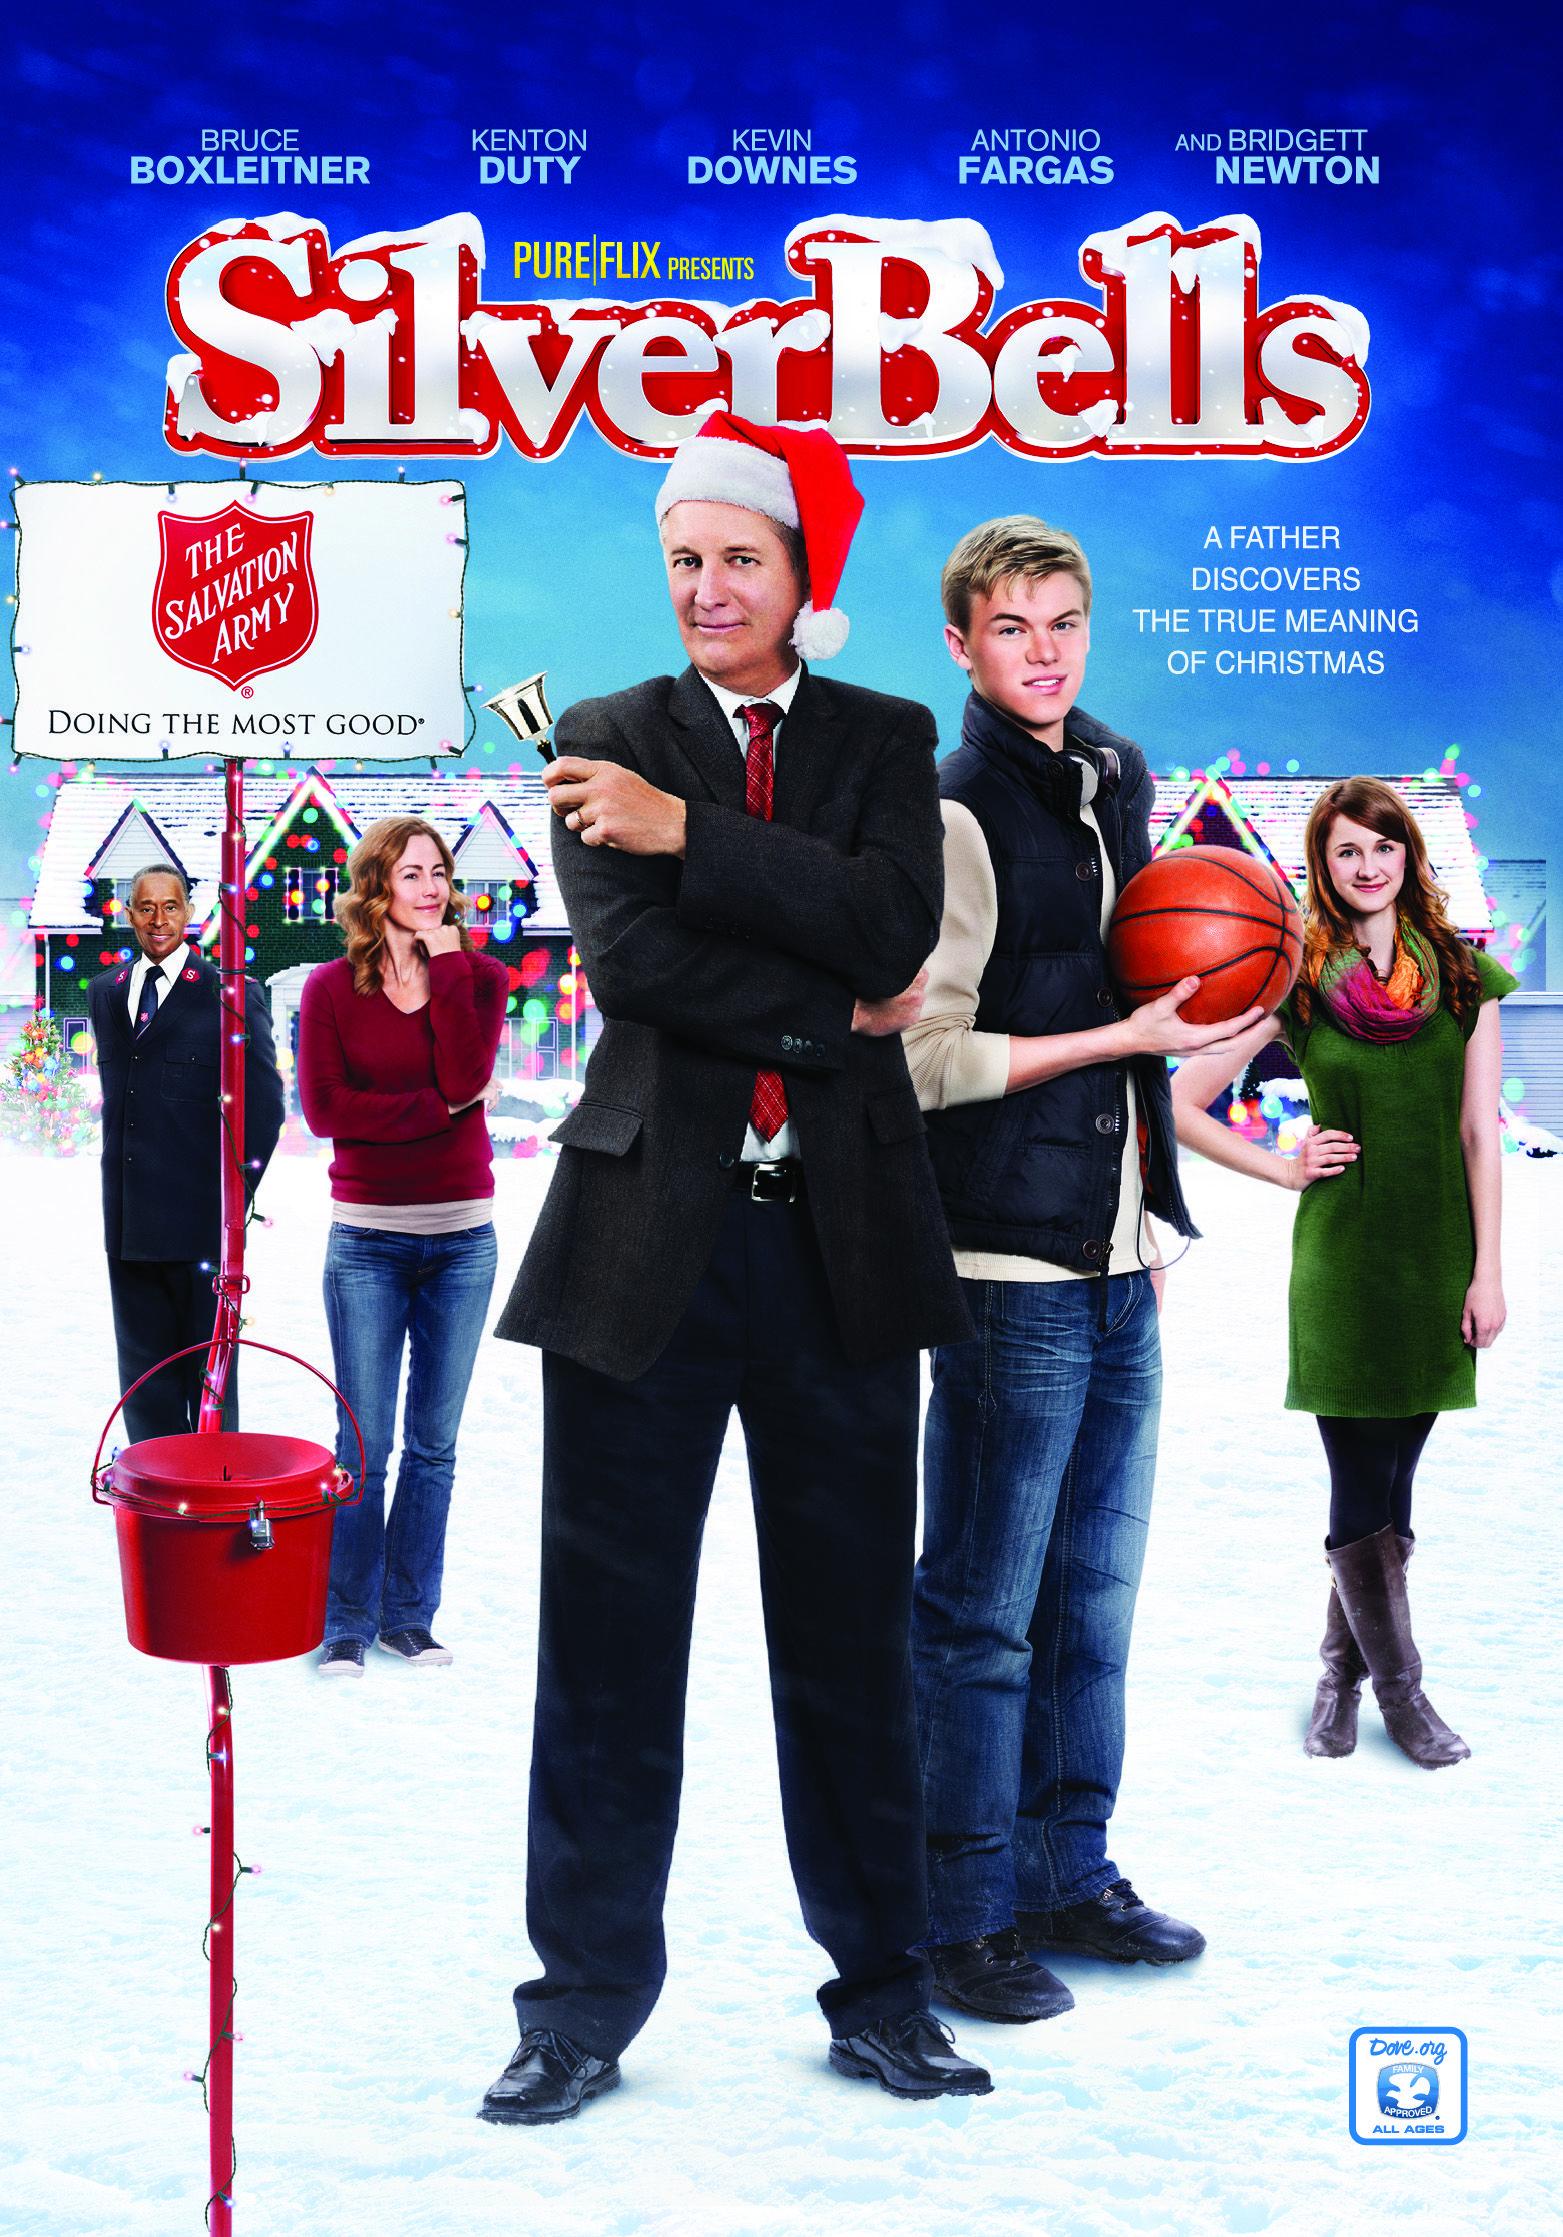 Silver Bells starring Bruce Boxleitner, Kenton Duty